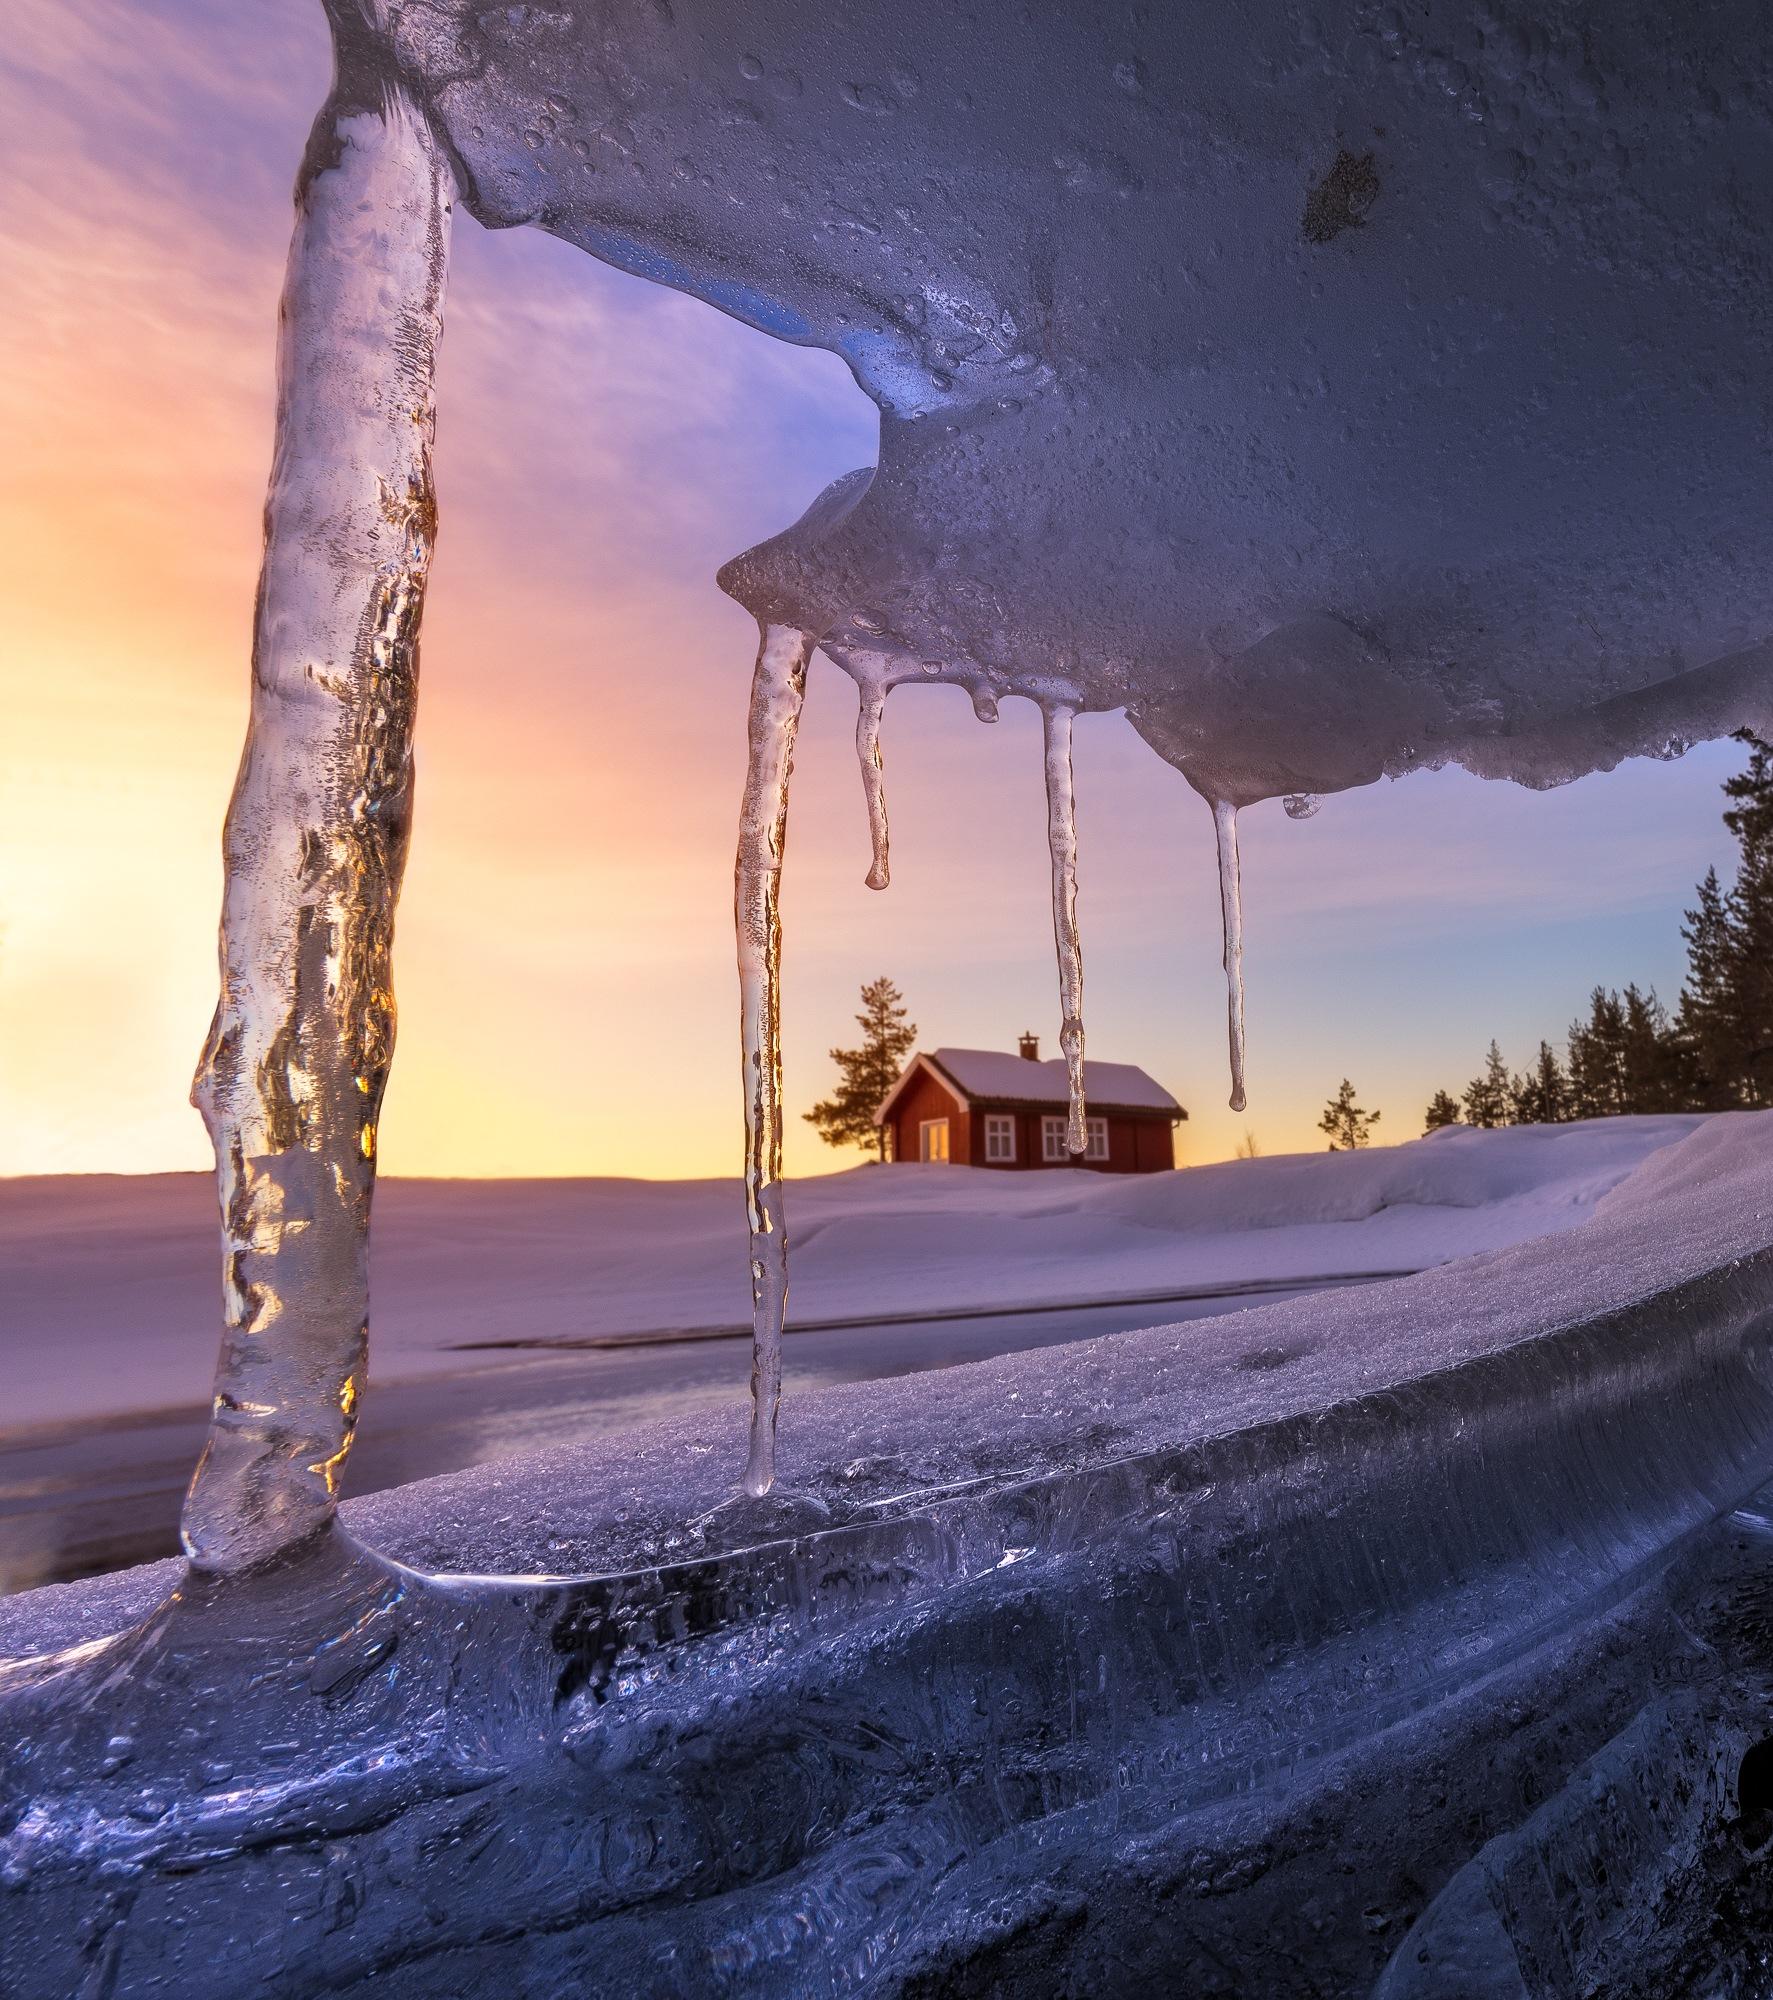 The red cabin  by oeyskarl